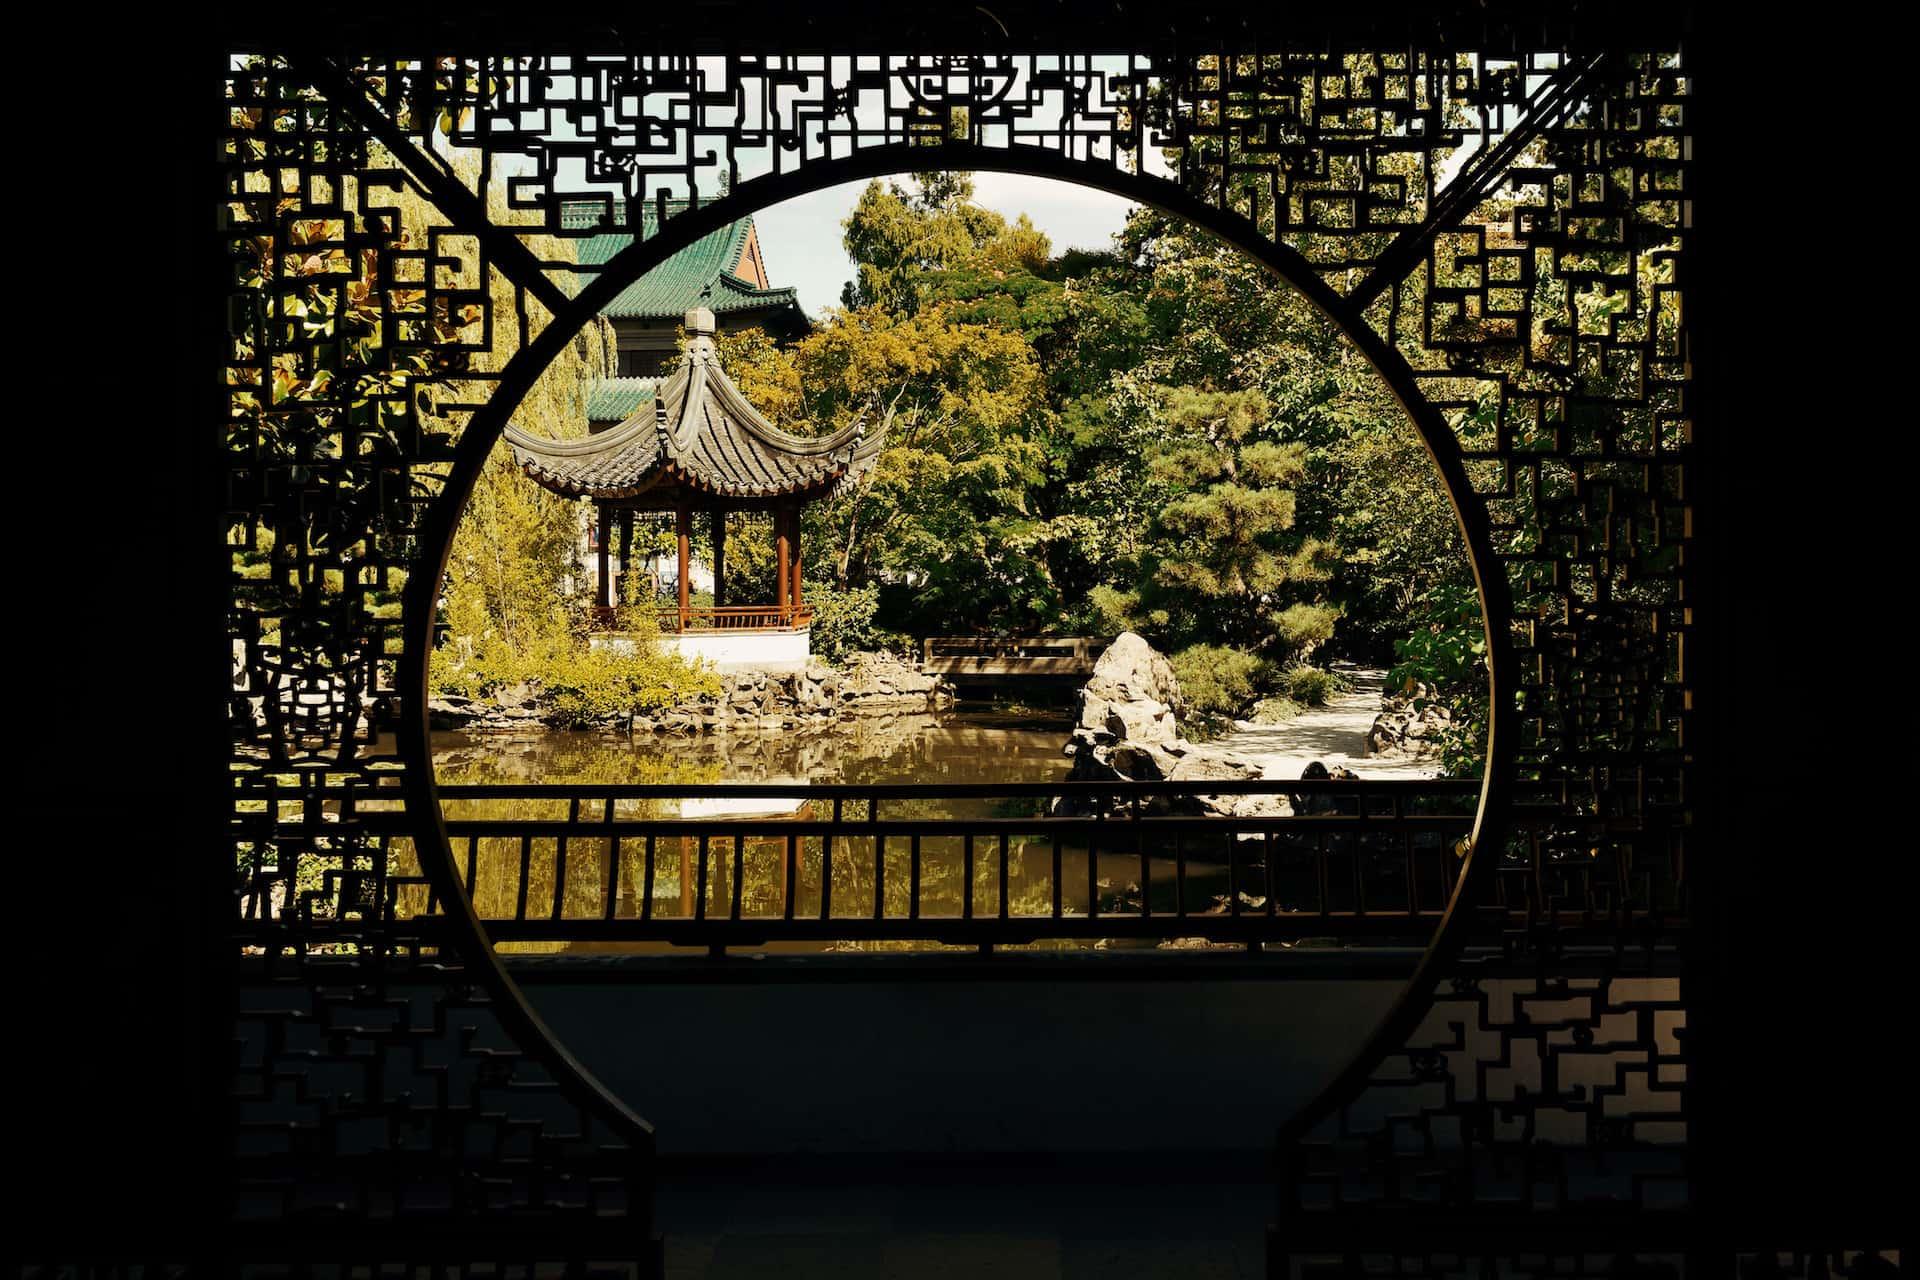 Dr. Sun Yat-Sen Classical Chinese Garden - WESTCOAST Sightseeing